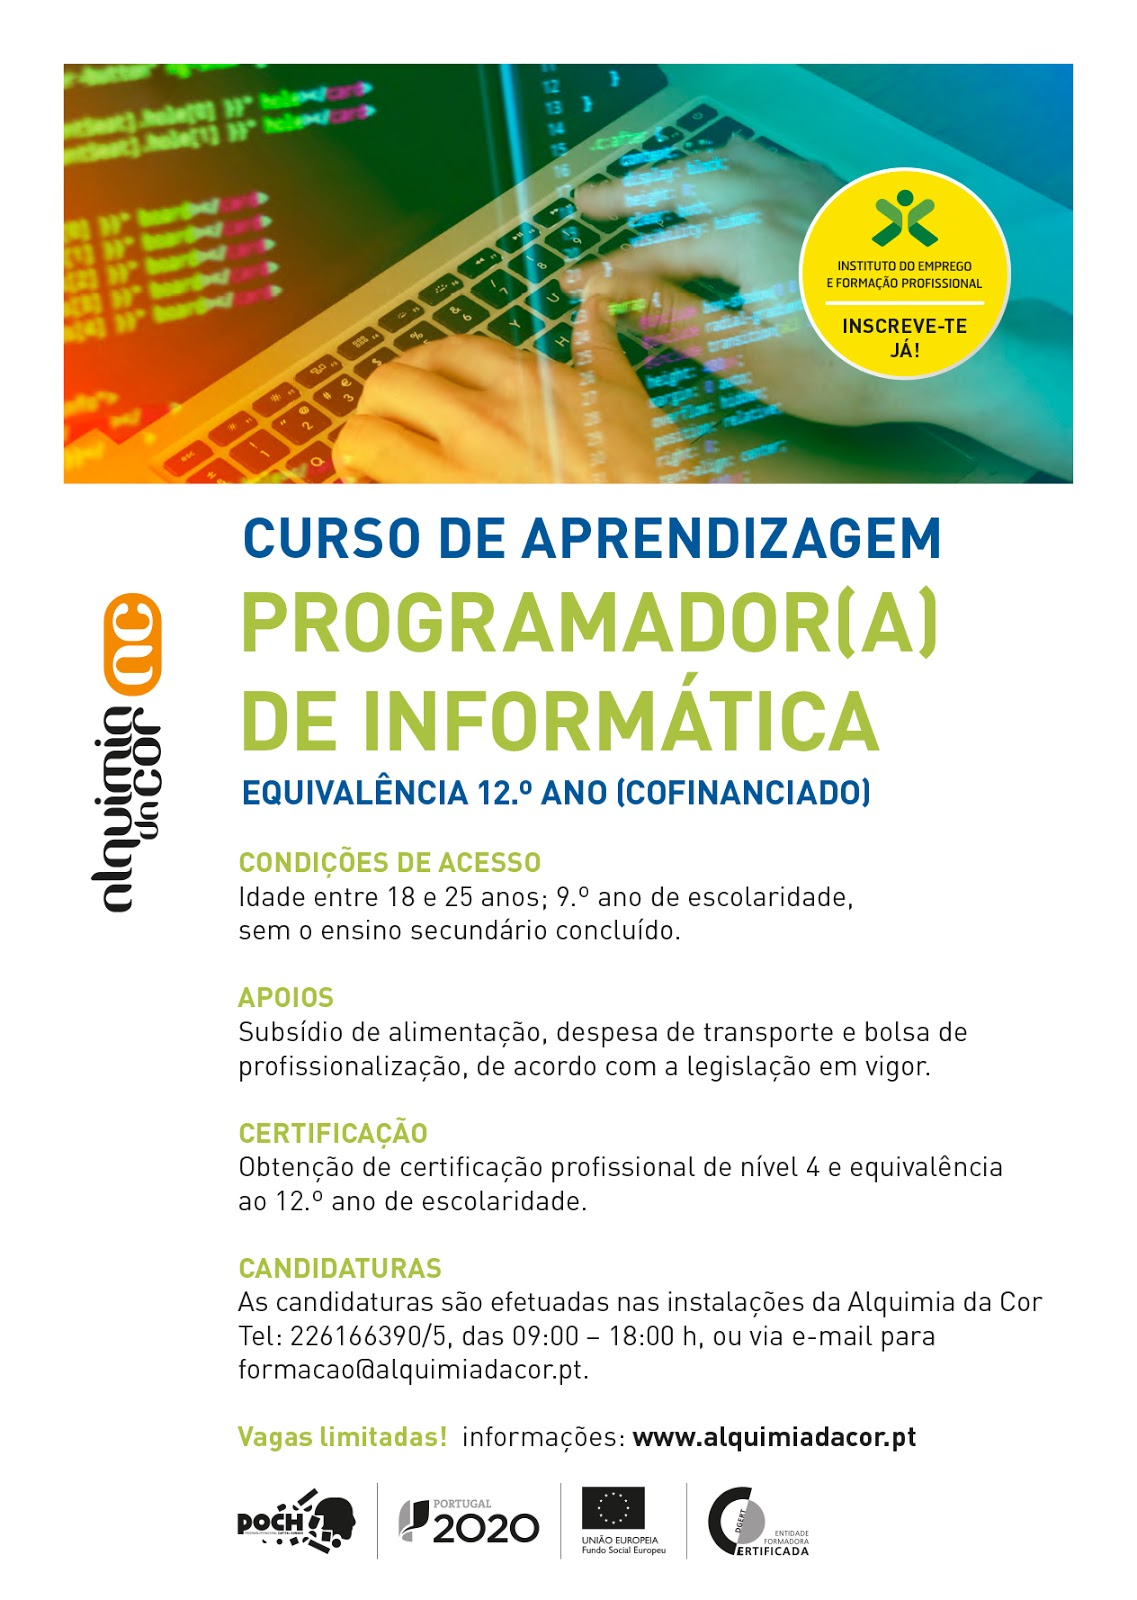 Curso co-financiado: Programador/a de Informática – Porto (equivalência 12º ano)